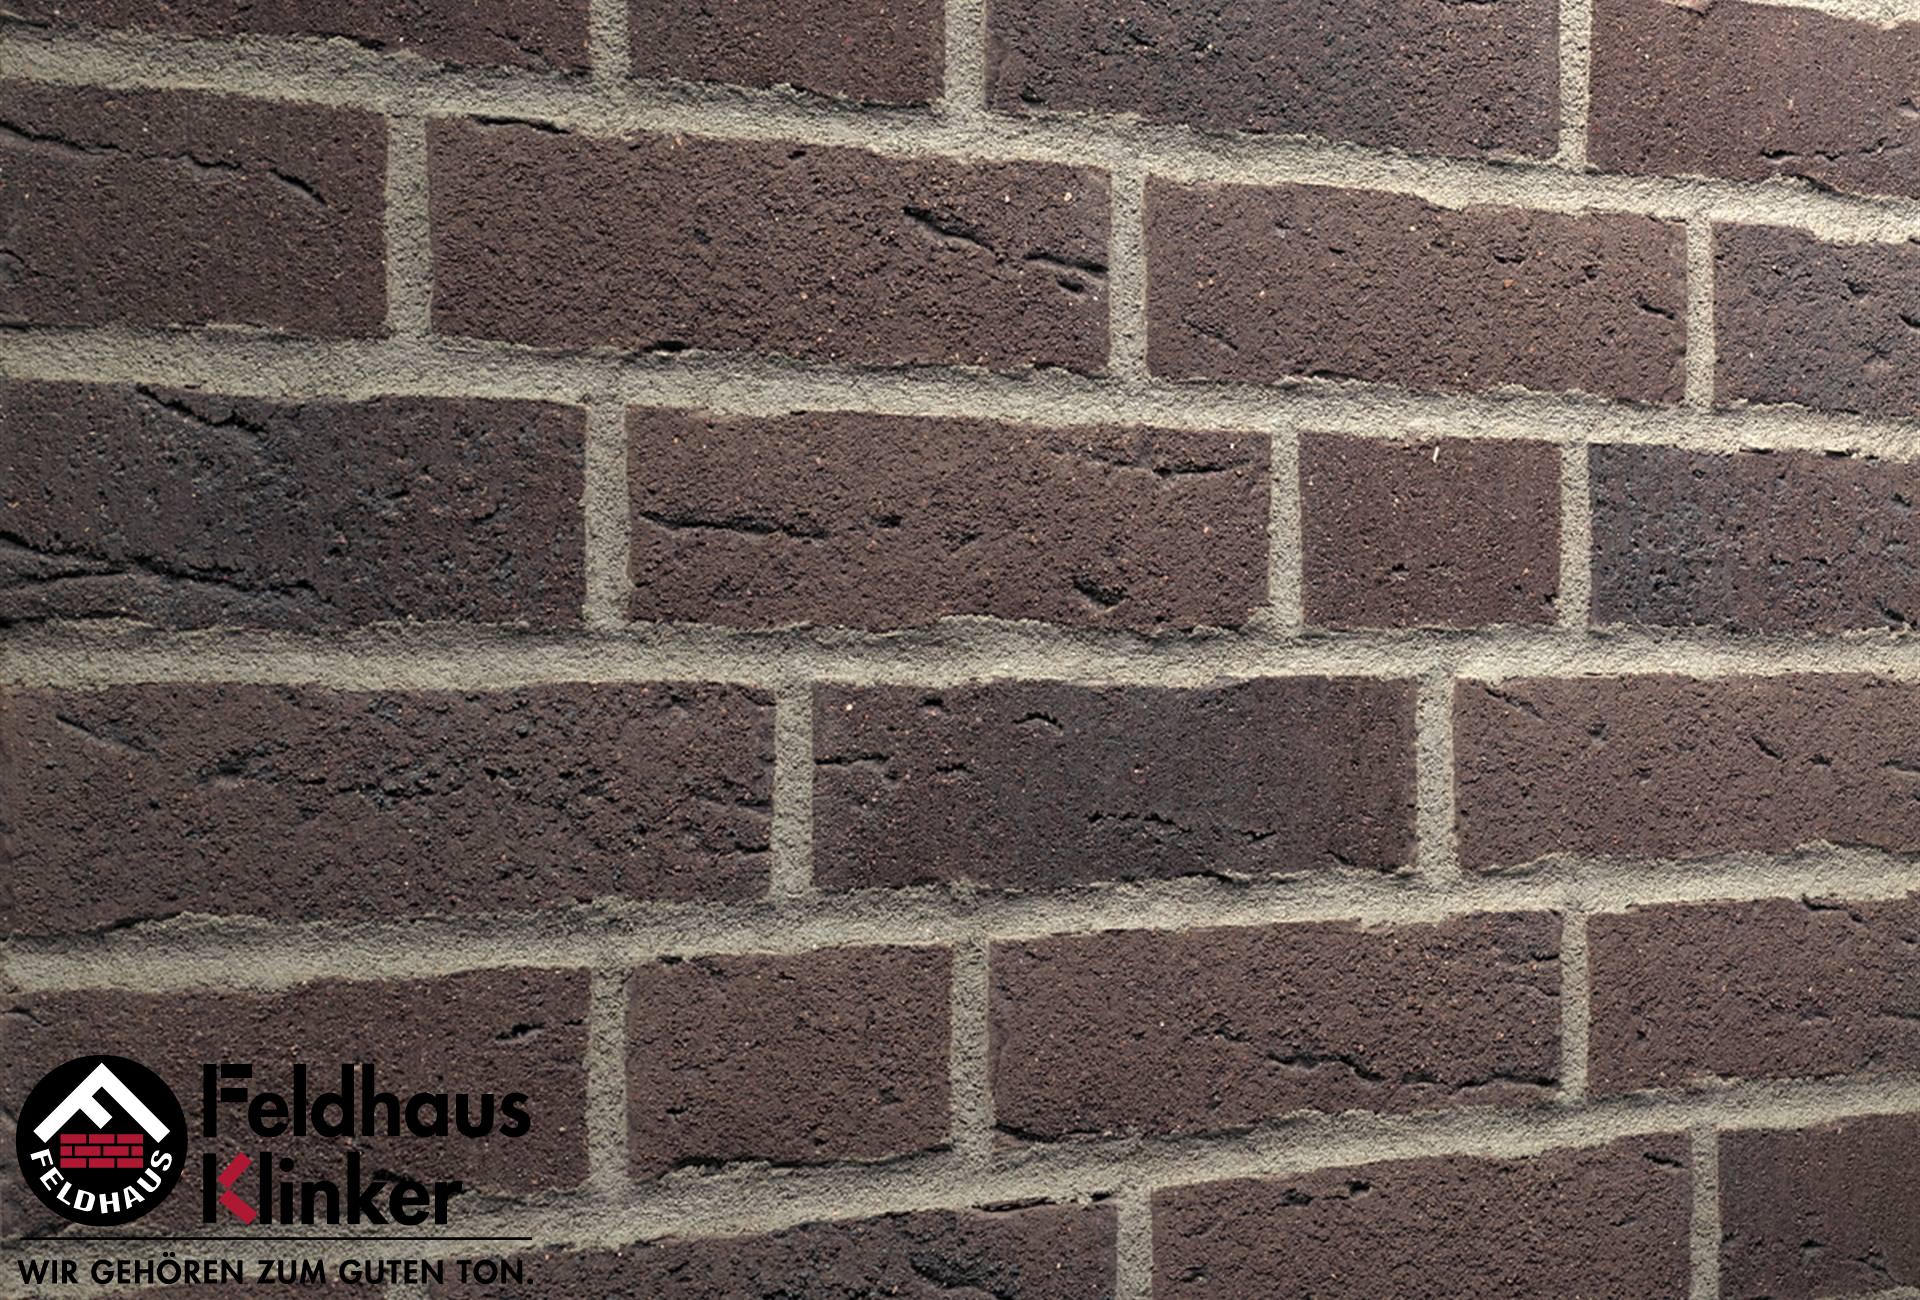 K697 Feldhaus Klinker вид 1